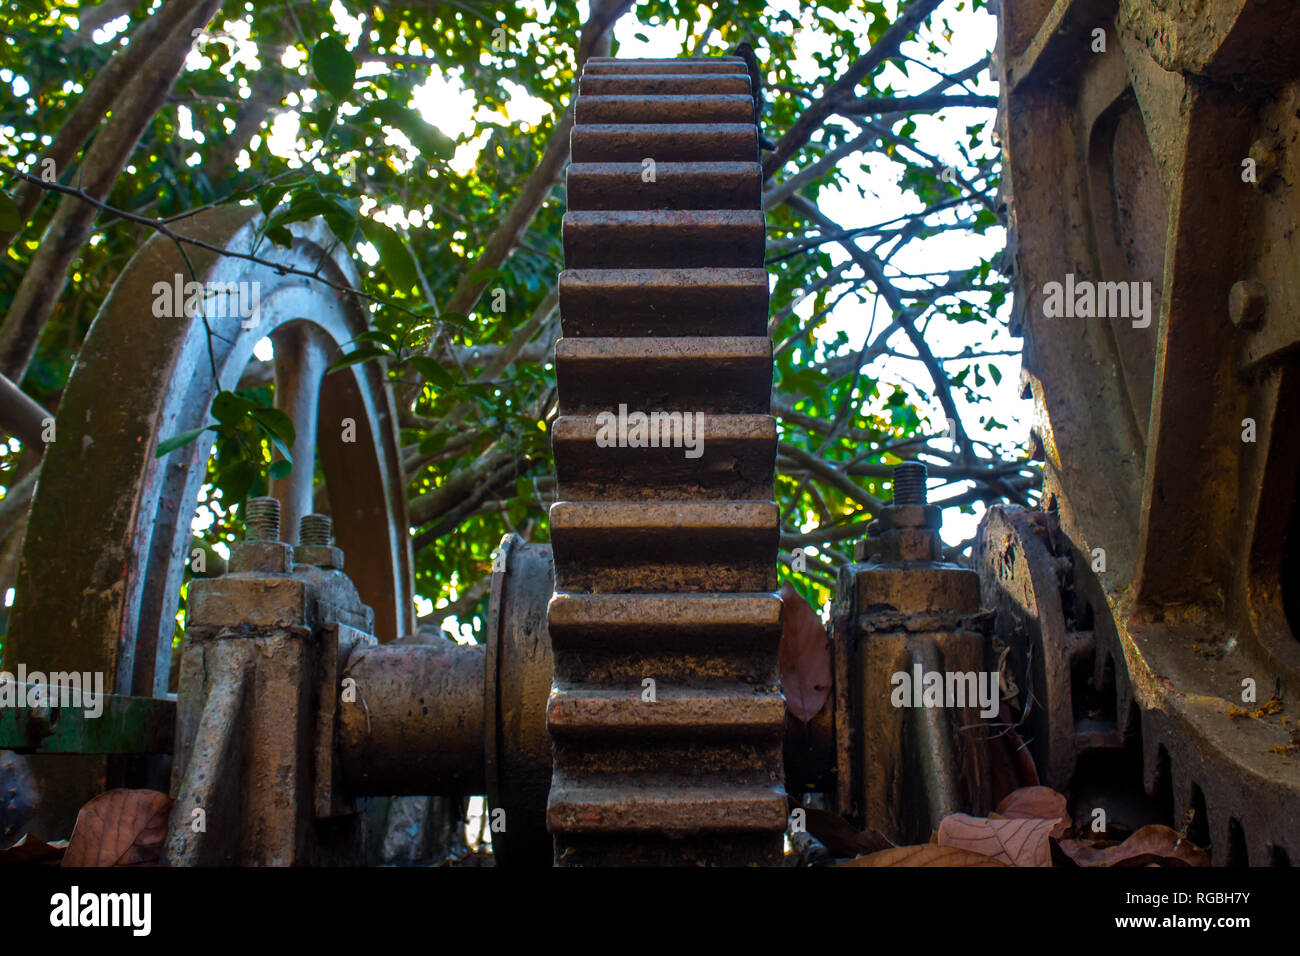 Gears or gears of rusty metal left unused, old sugar cane milling - Stock Image